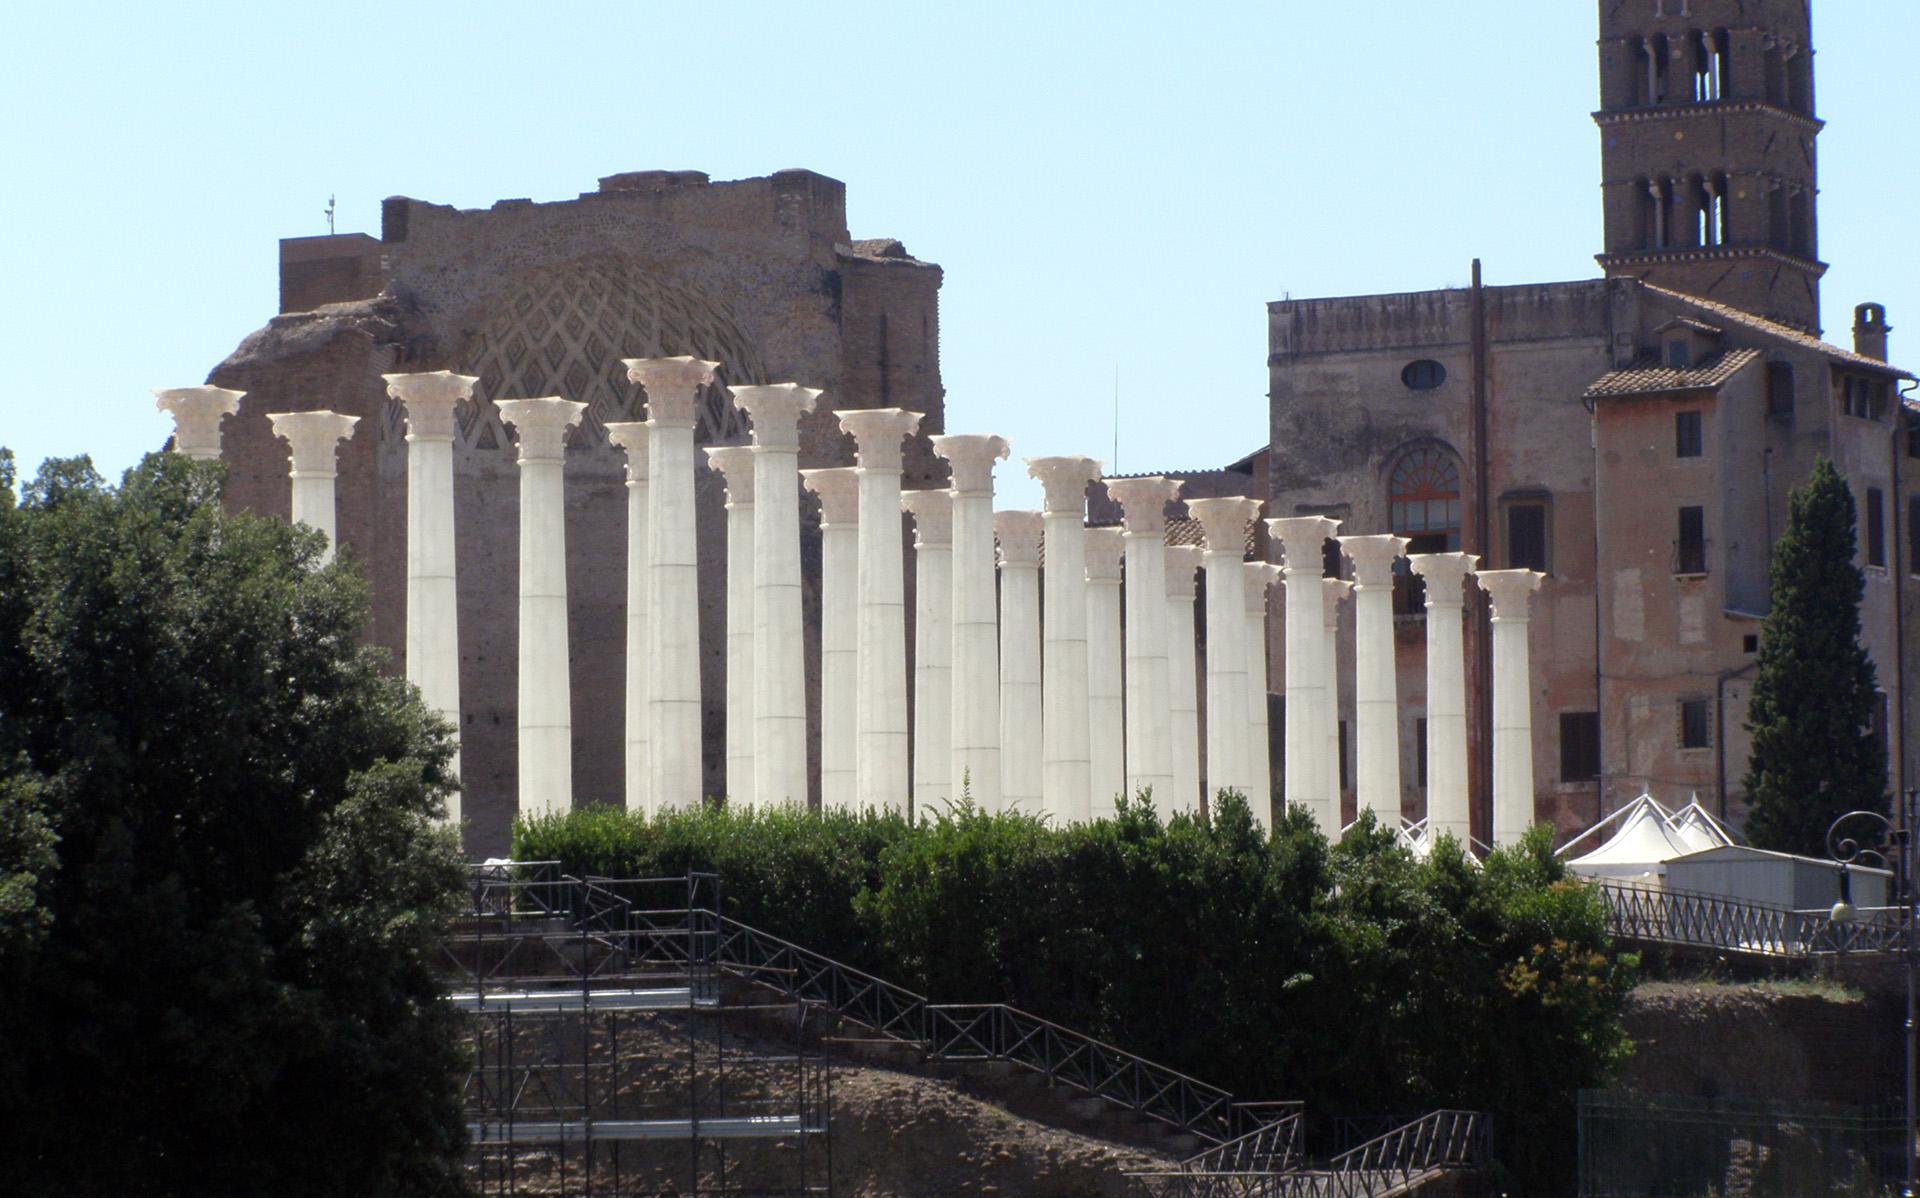 Valentino Columns and Venus Statue